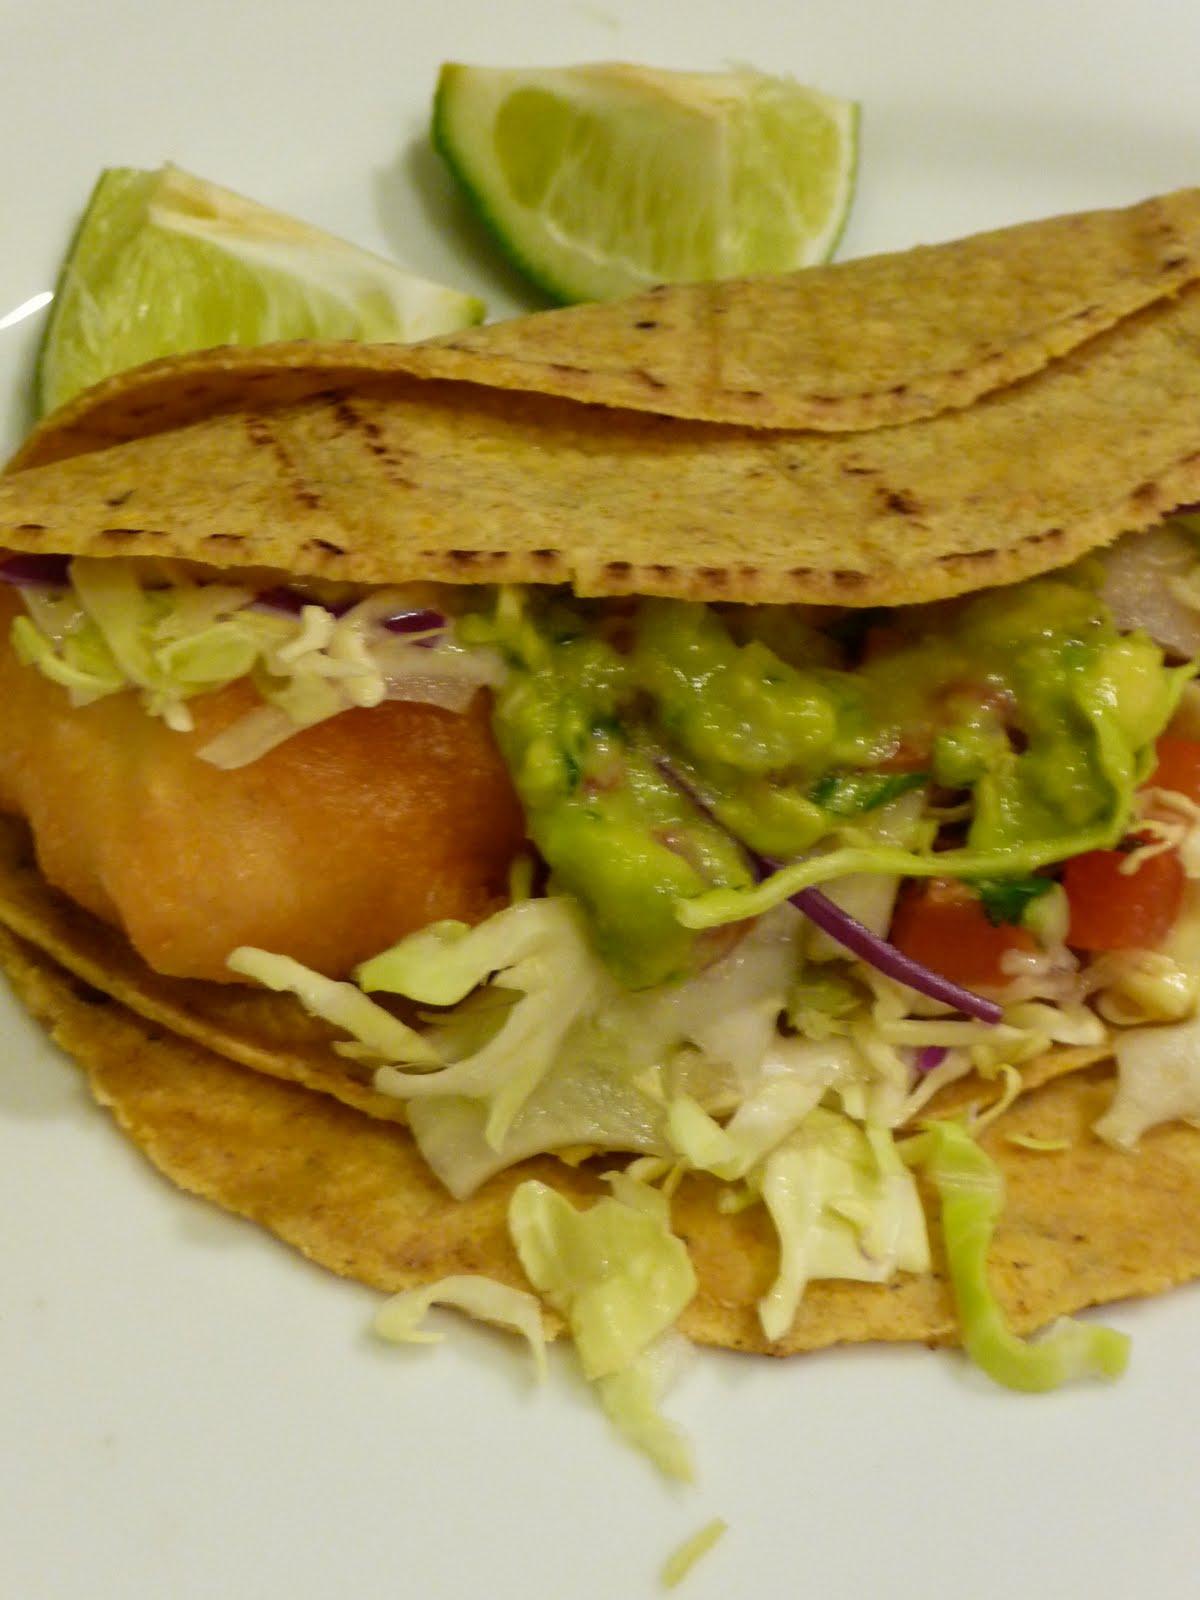 Epicurean mom halibut tacos for Halibut fish tacos